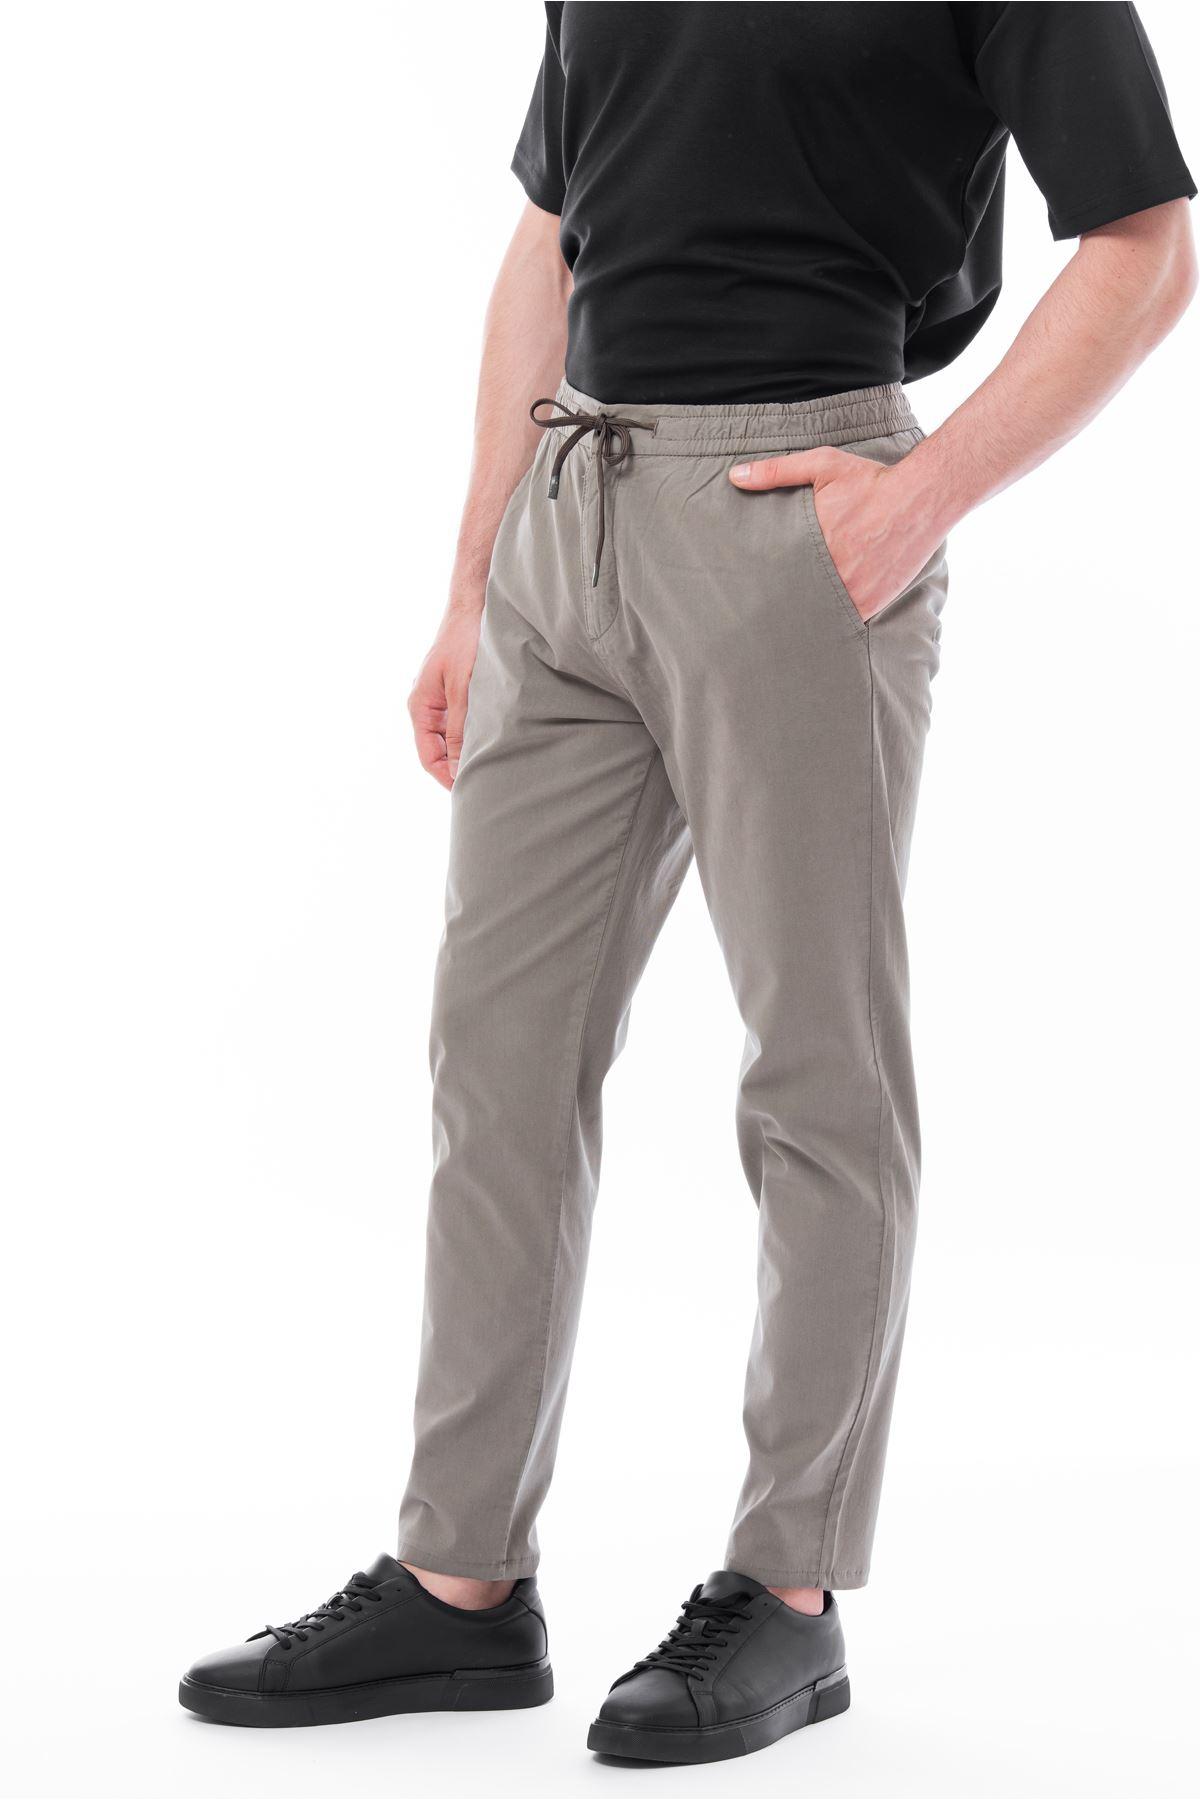 Haki Beli Lastikli Bağcıklı Jogger Pantolon